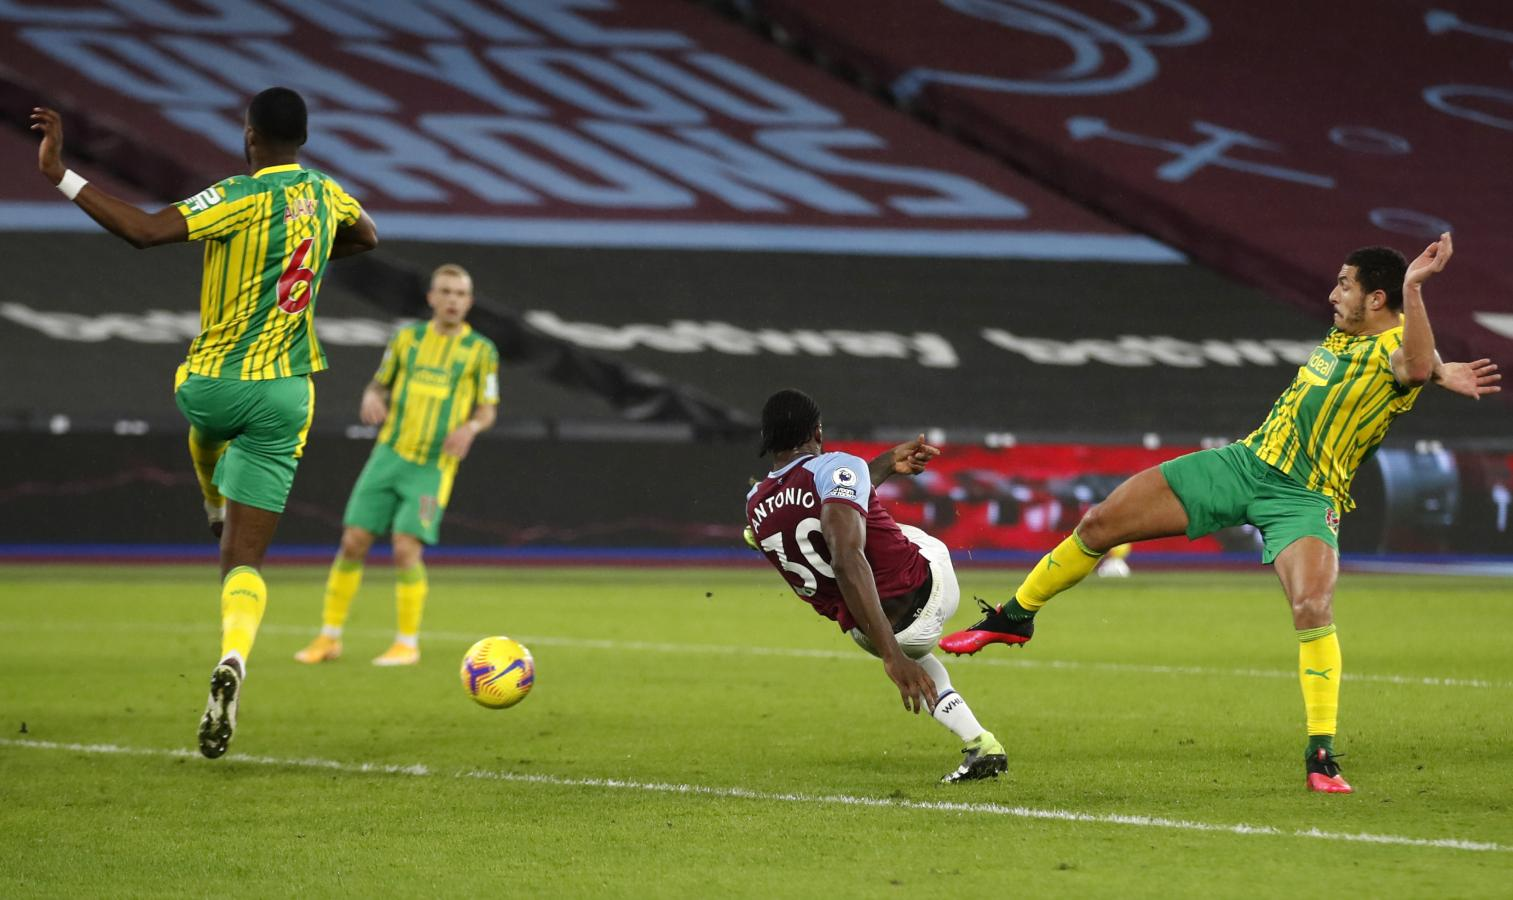 Michail Antonio, la figura de la cancha, le da el triunfo a West Ham con esta volea.